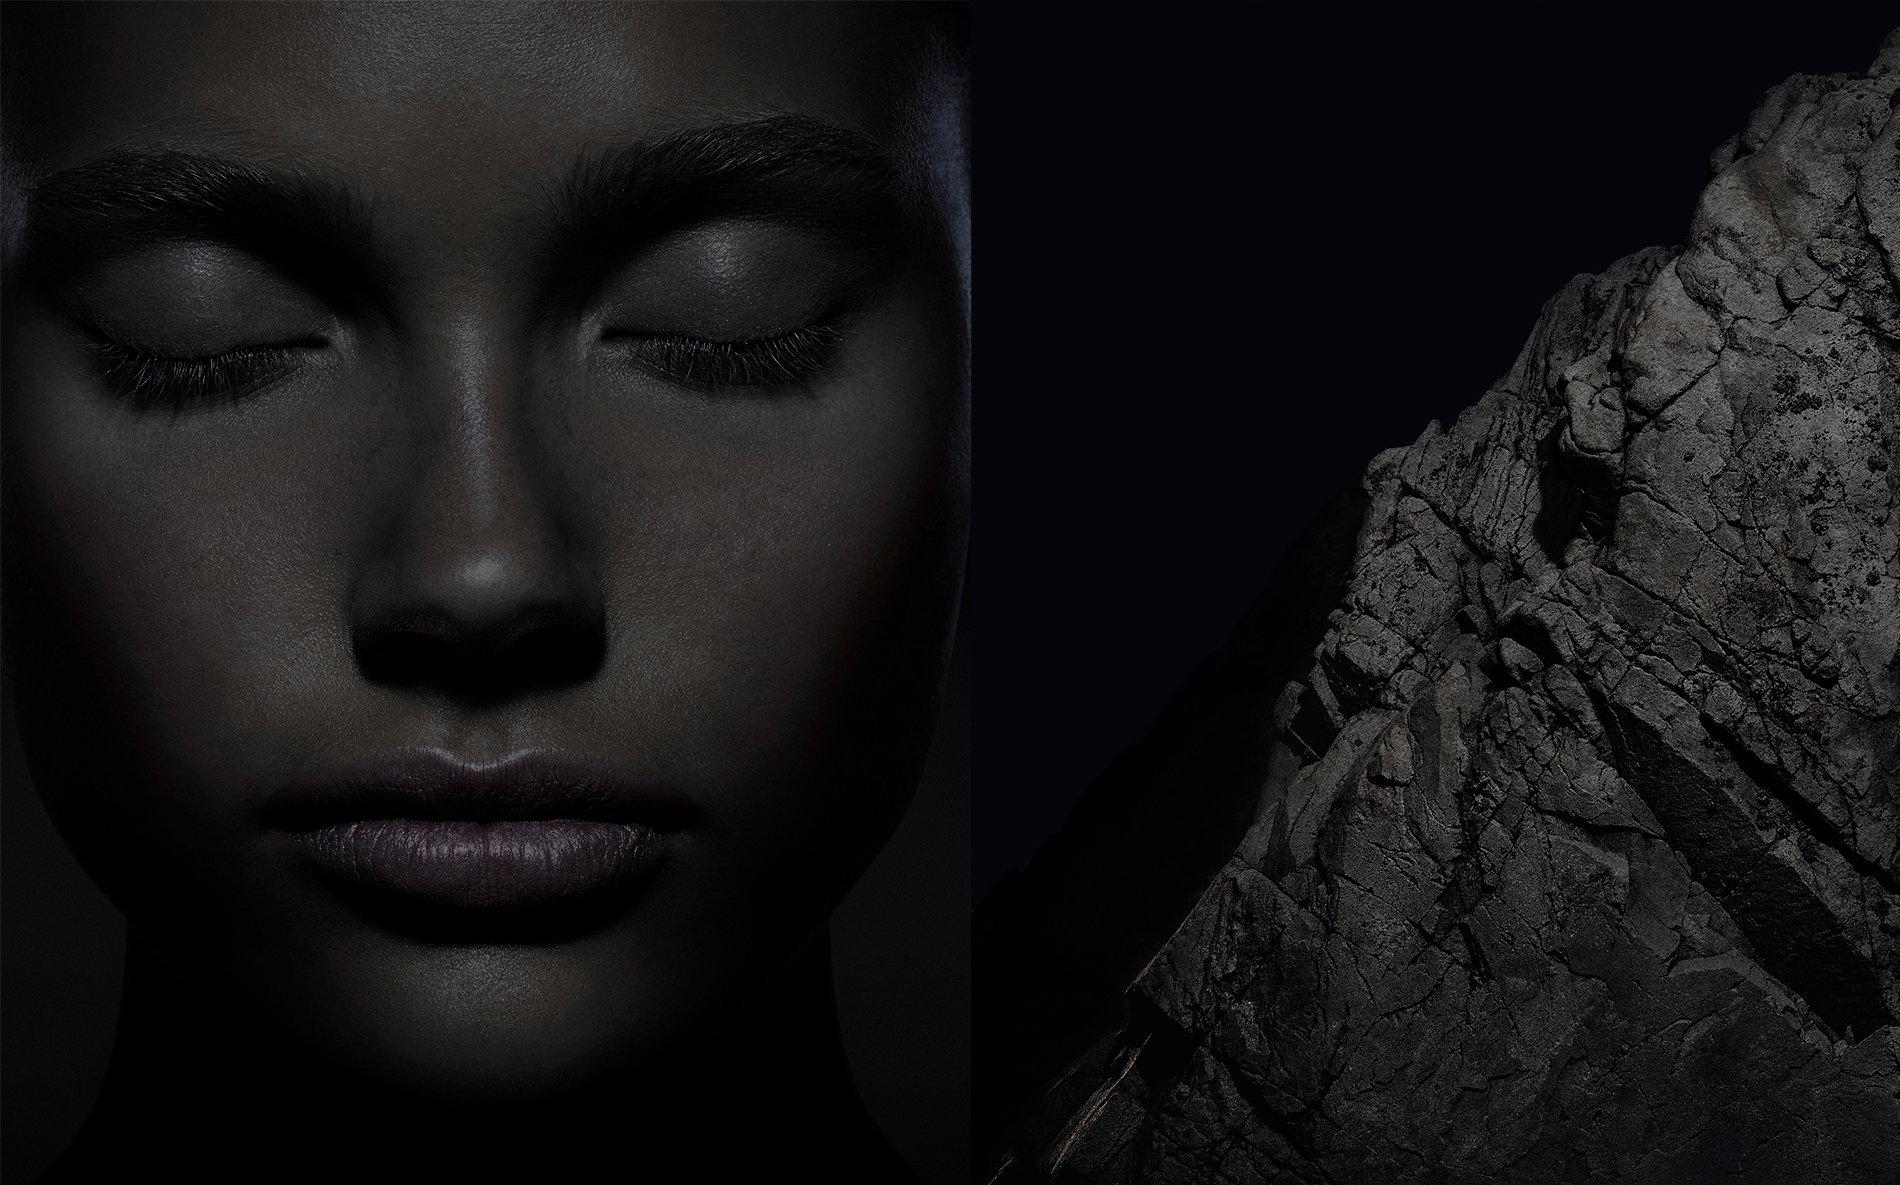 0004_Dark_Beauty_closed_eyes_copyright_Kenneth_Rimm.jpg